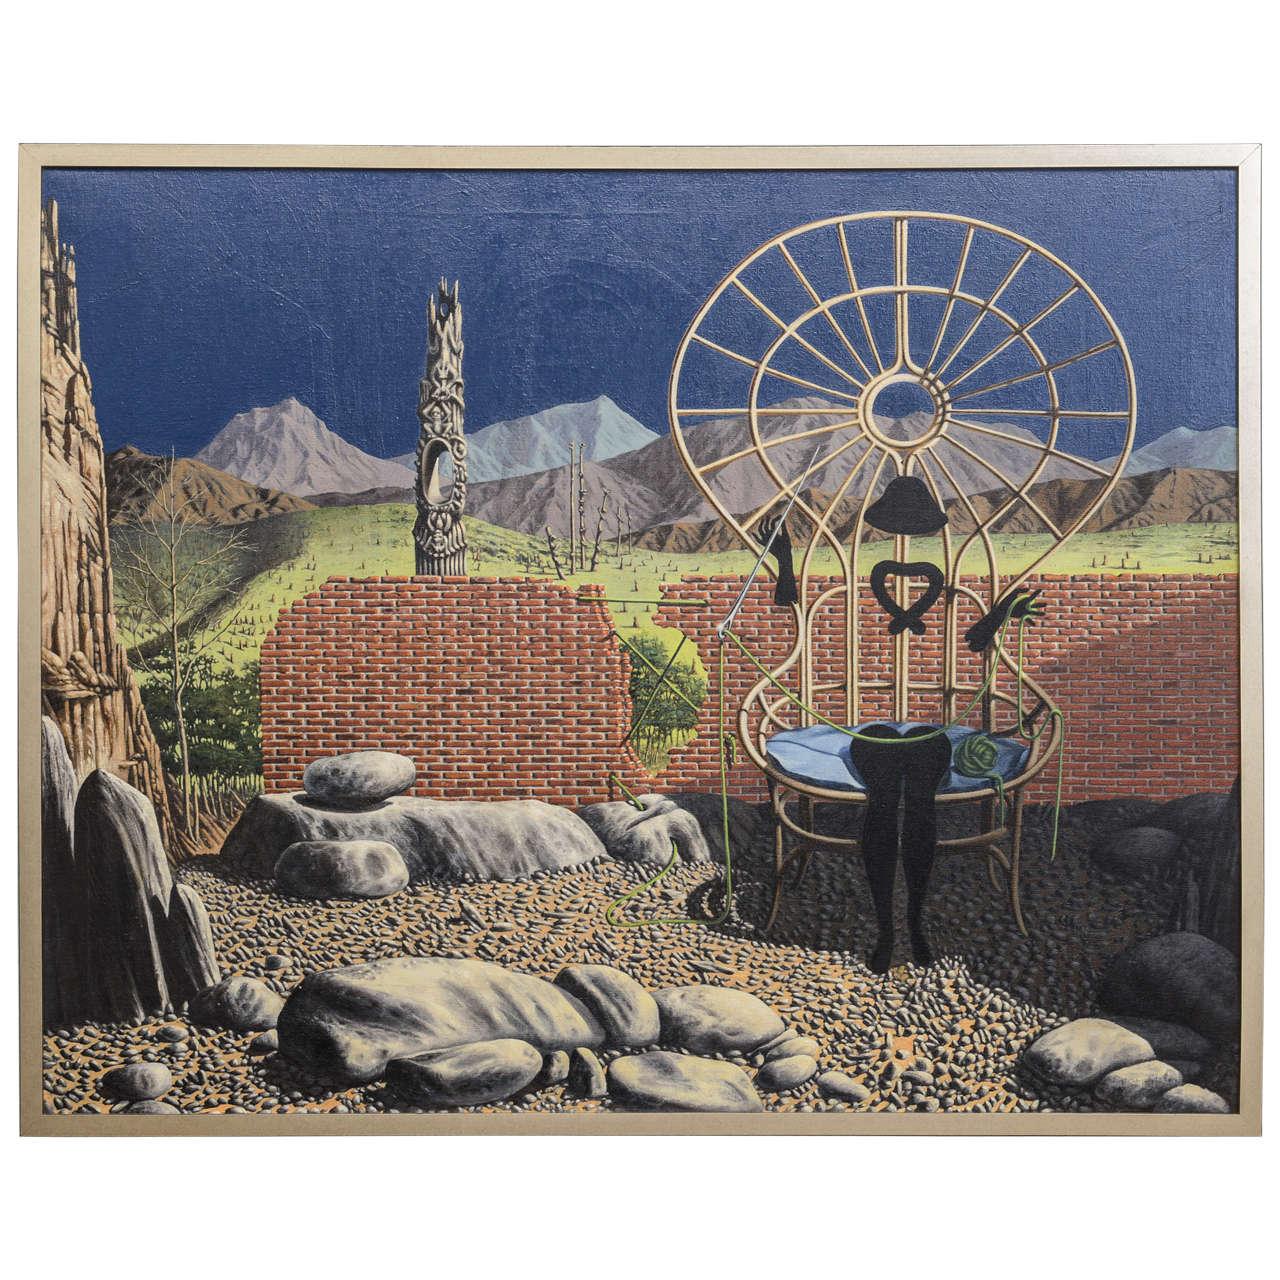 Ruth's Dream by Robert Springfels, 1968